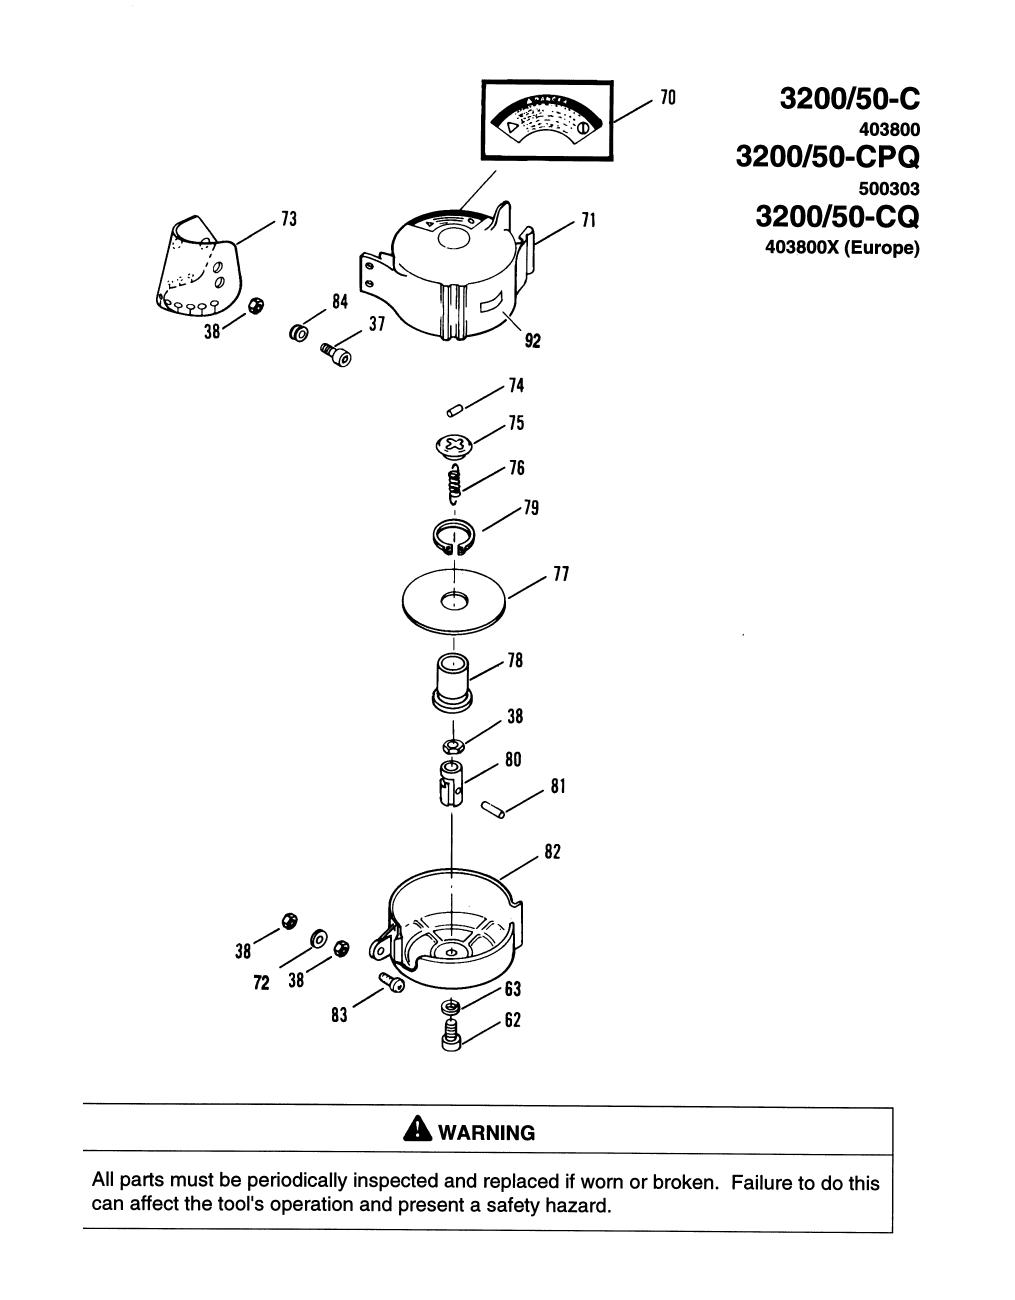 403800-Paslode-PB-1Break Down